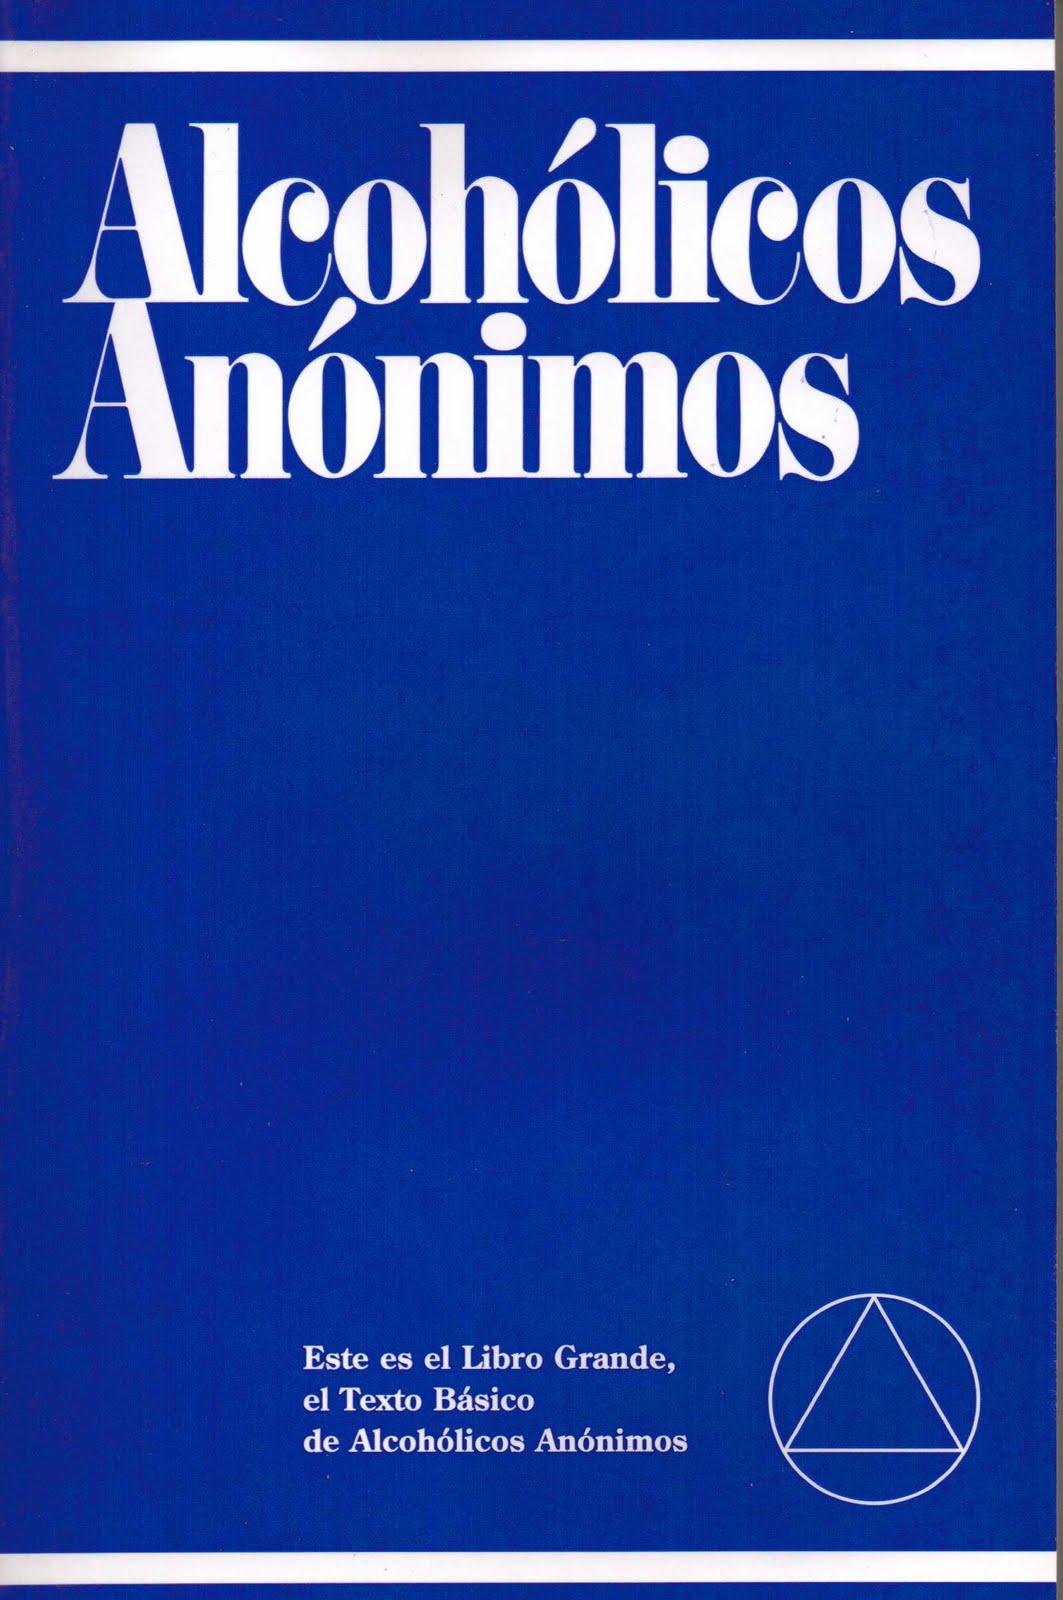 ALCOHOLICOS ANONIMOS LIBRO AZUL PDF DOWNLOAD